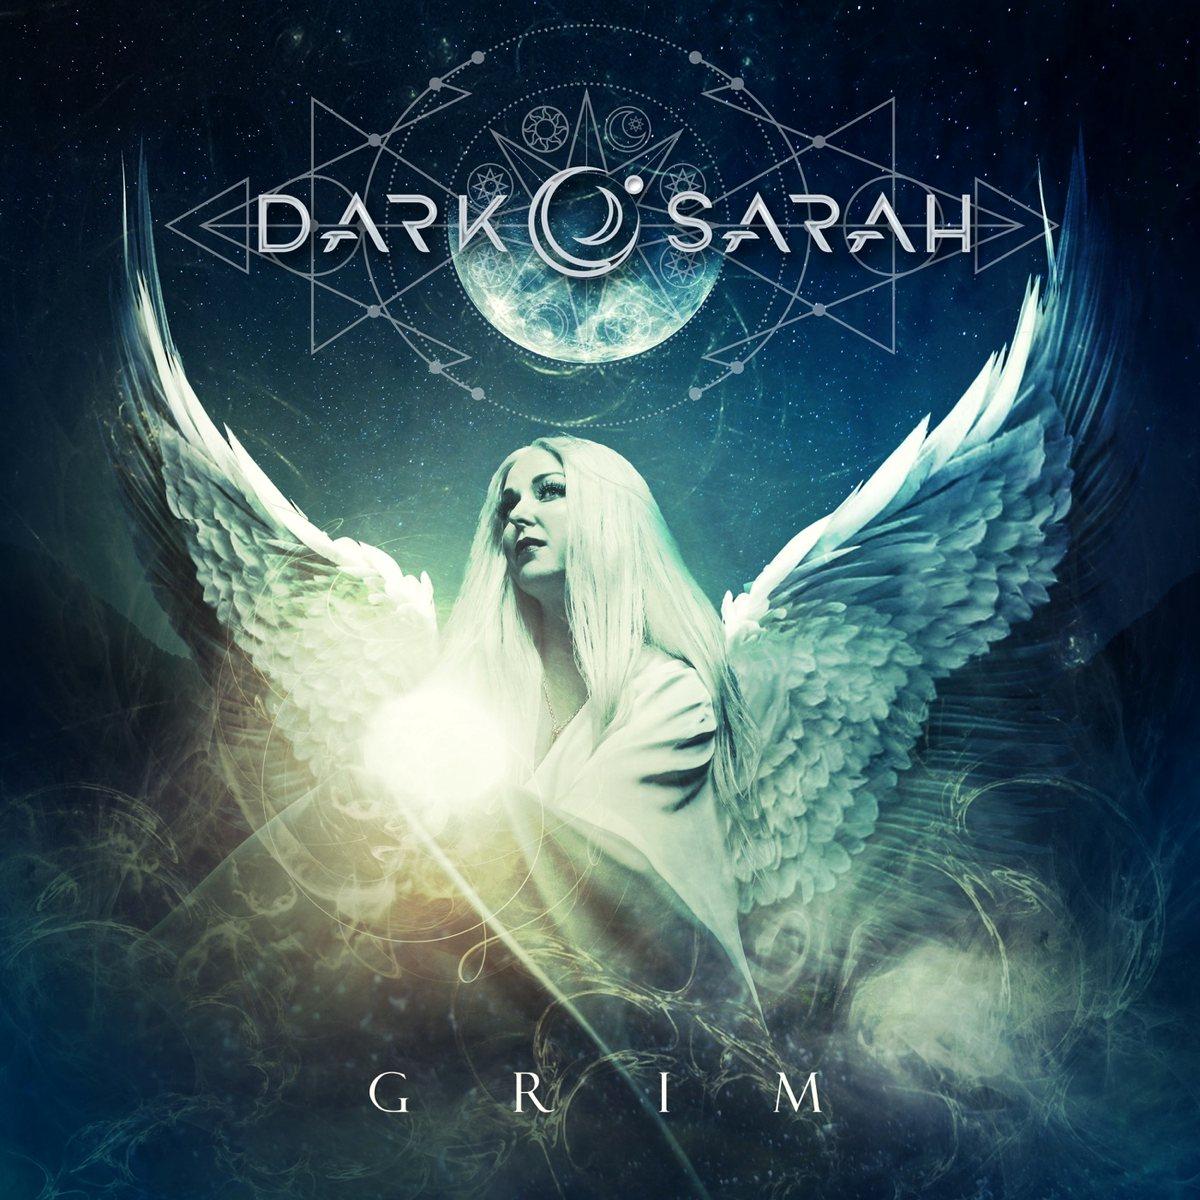 "DARK SARAH RELEASE LIVE VIDEO FOR ""MELANCHOLIA""  @DarkSarahHQ   #darksarah #metal #symphonicmetal #finland #finlandia #musicextreme #music #art #band #newmusic #mondaythoughts #MondayVibes #MondayMorning #follow #followme RT"